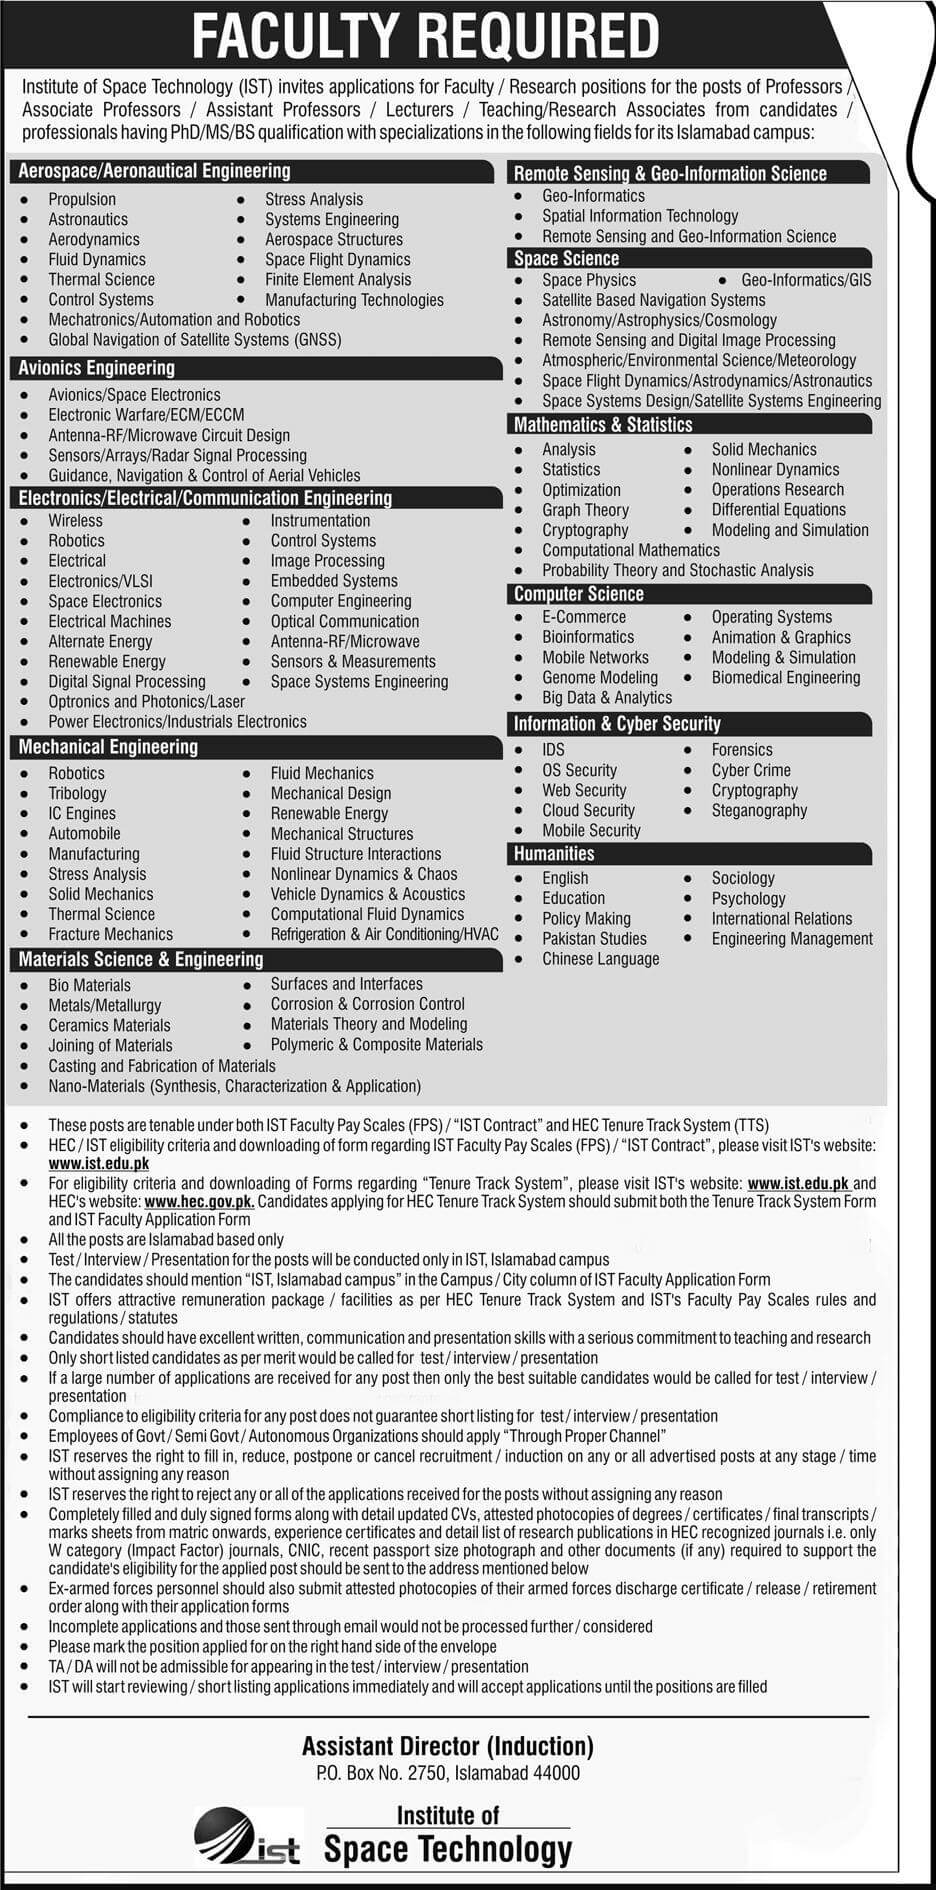 Faculty Staff Application Form jobtoday.pk